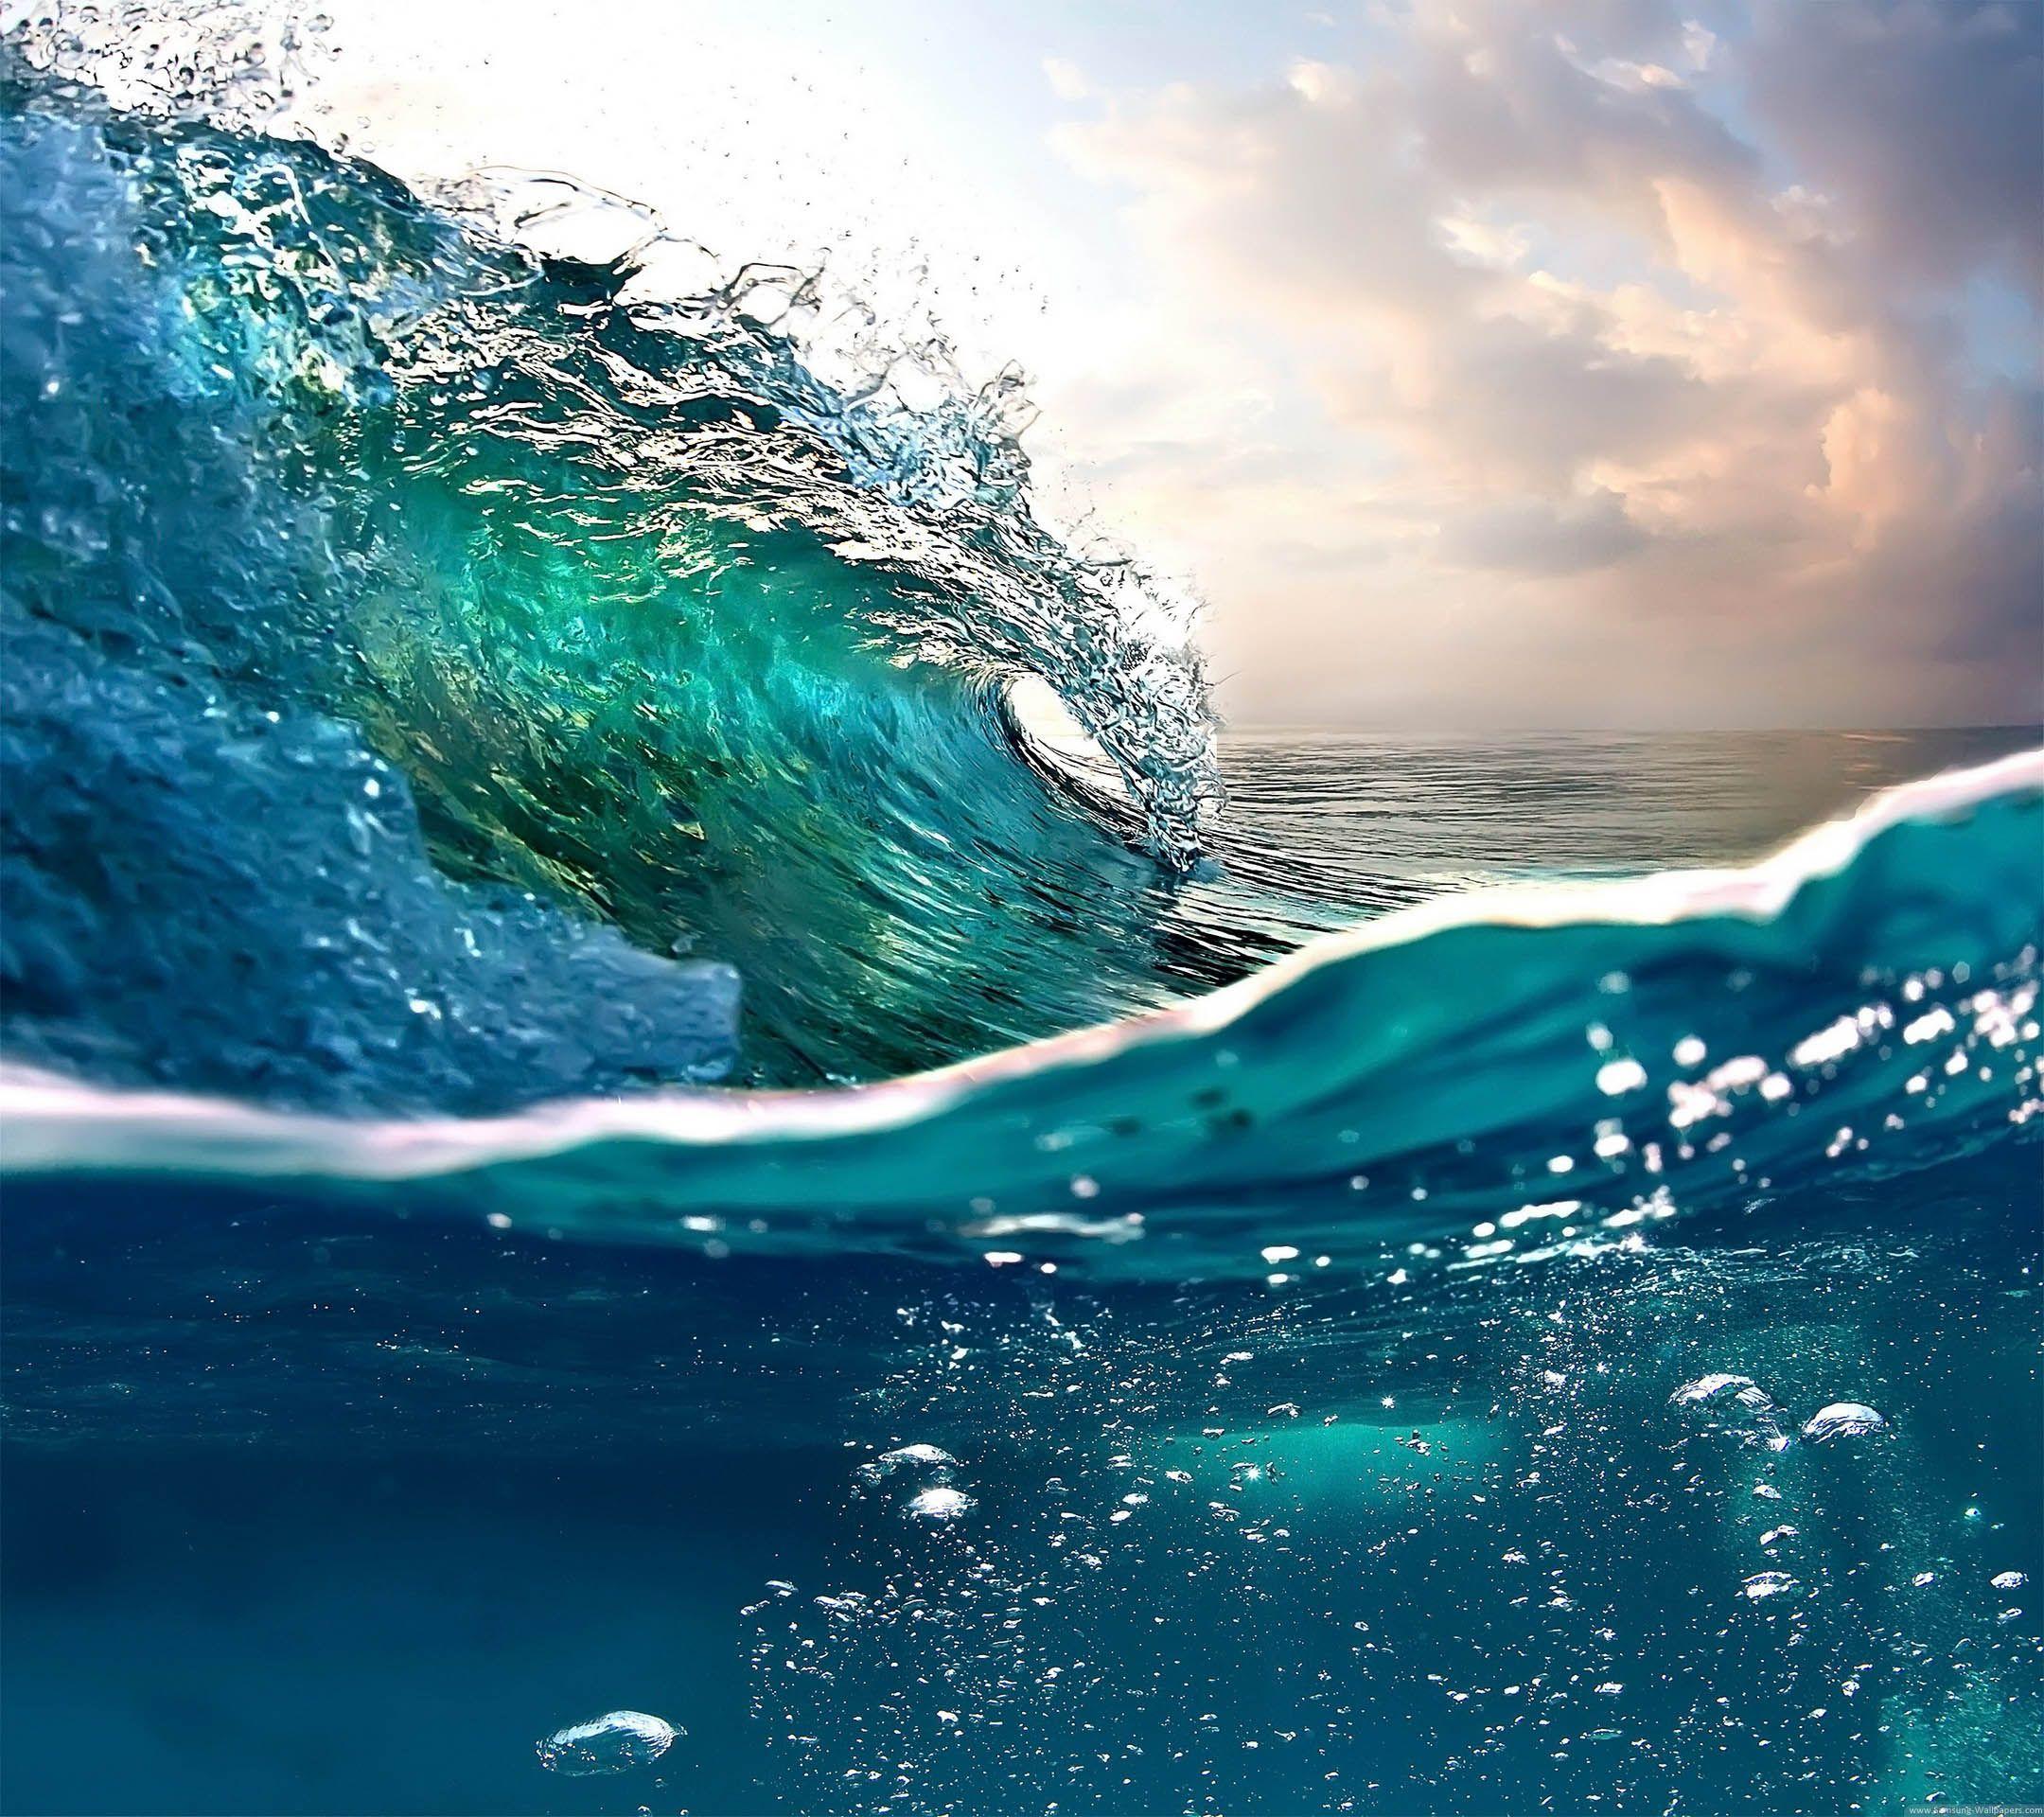 Sea Wave Stock 2160x1920 Samsung Galaxy S4 Wallpaper HD